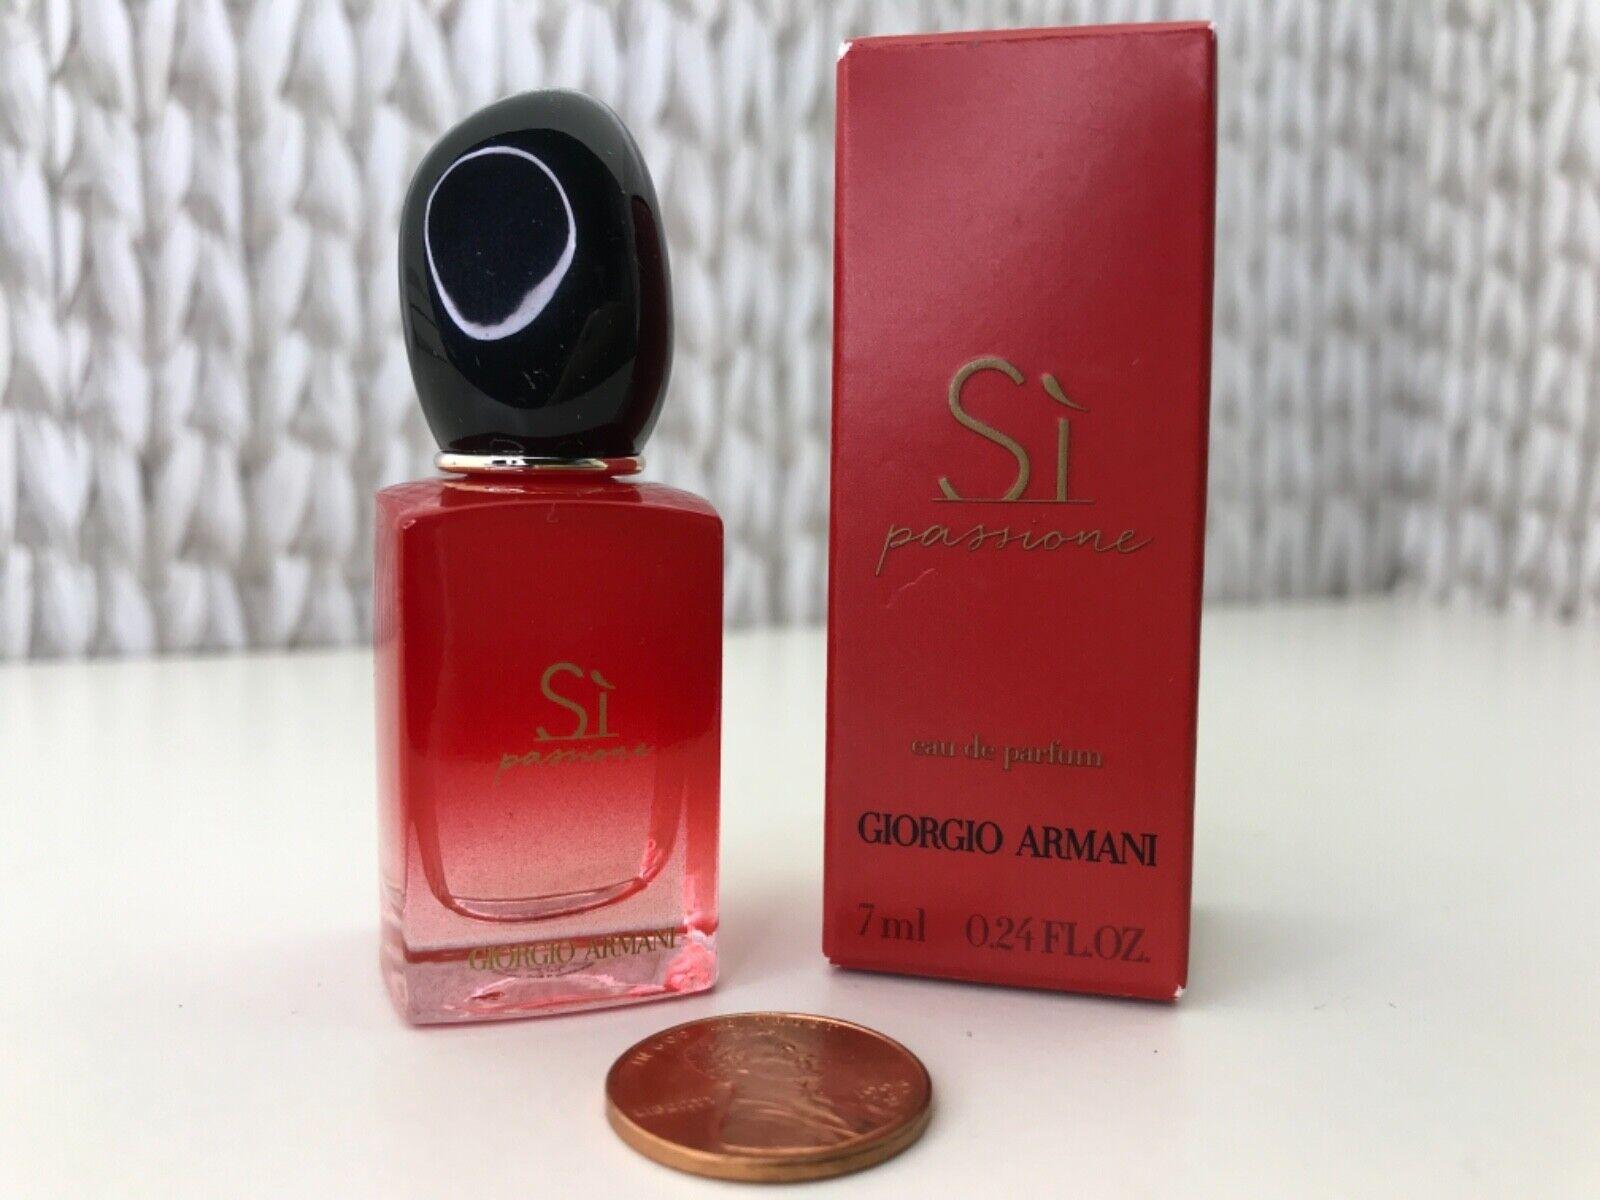 S Passione By GIORGIO ARMANI Women s MINI Perfume EDP Splash 0.24 Oz/ 7 Ml NIB - $18.99